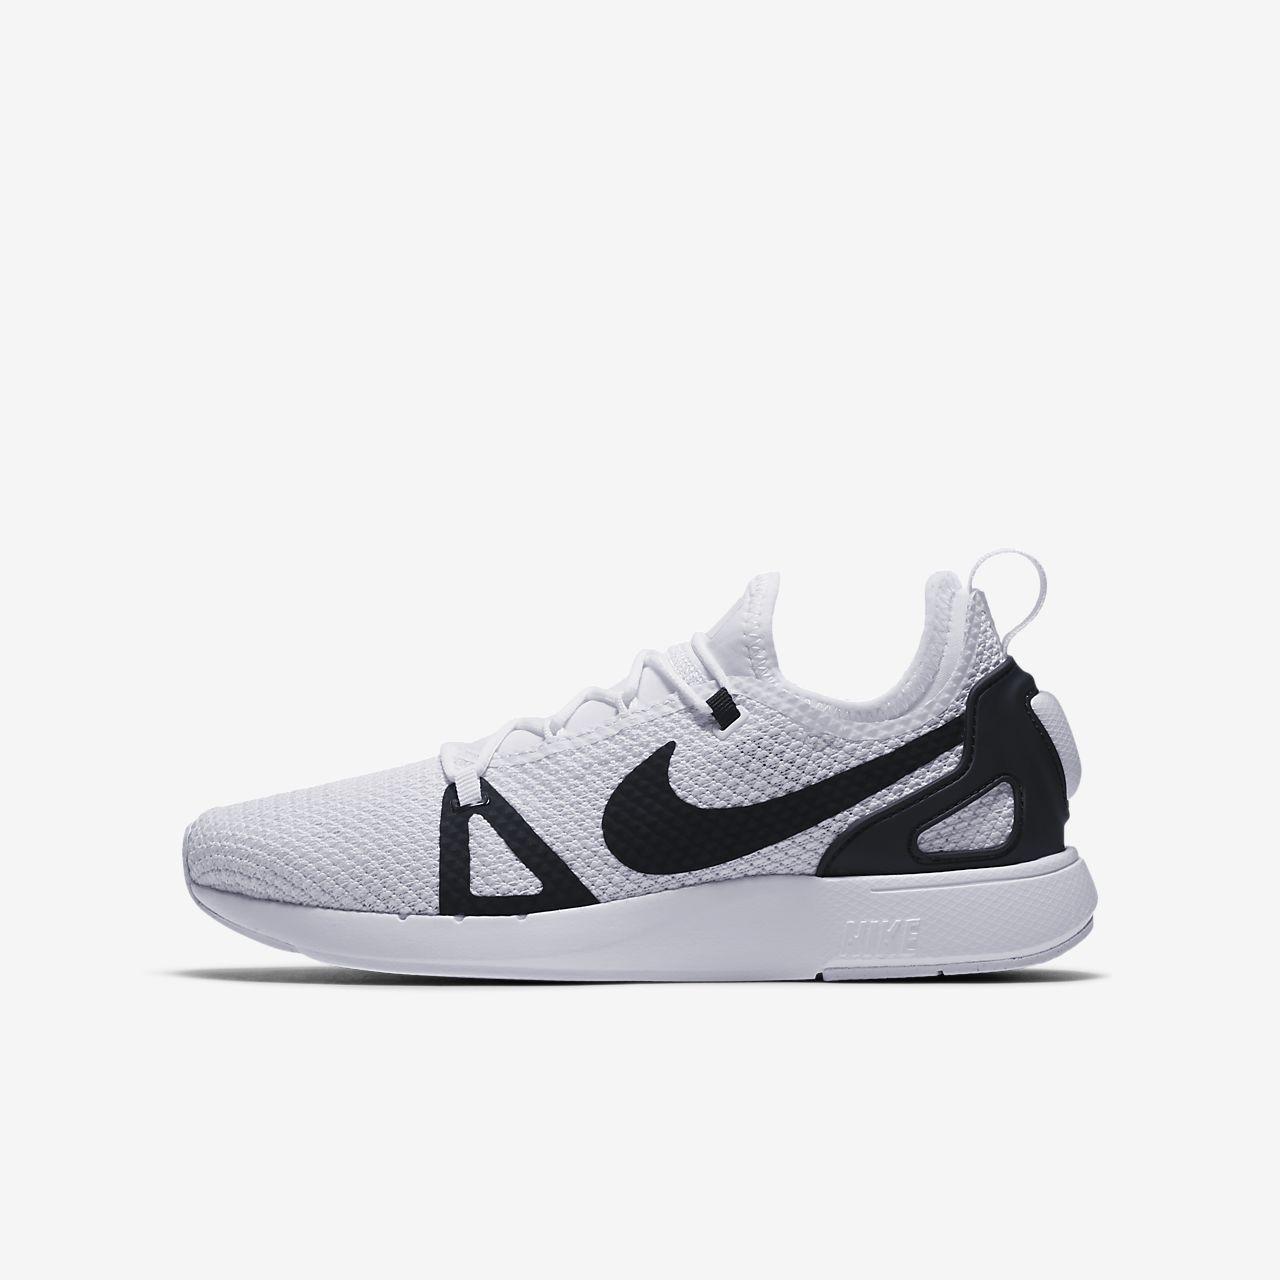 ... Nike Duel Racer Big Kids' Shoe